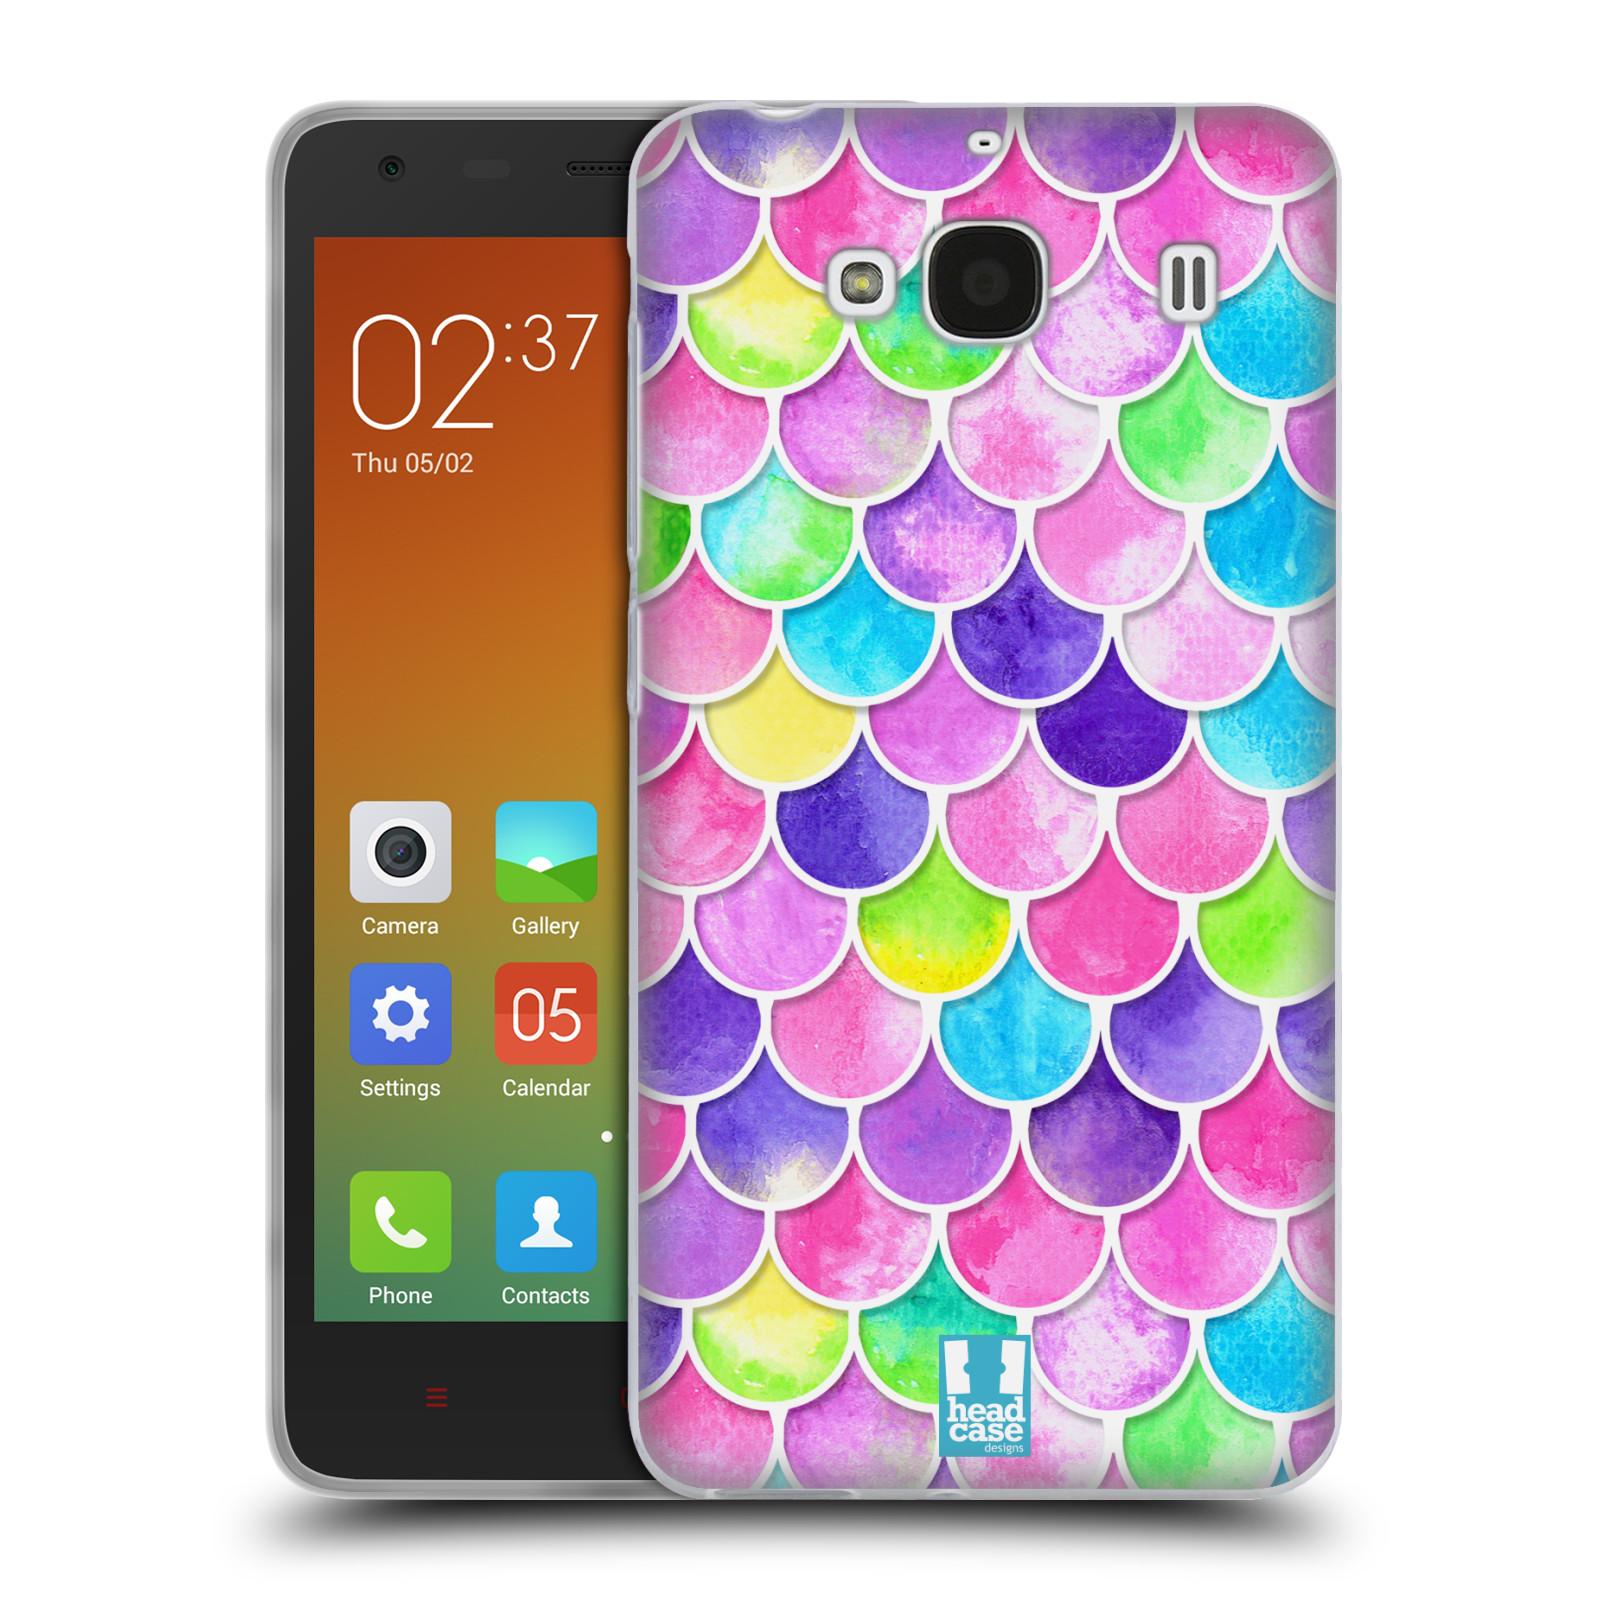 Silikonové pouzdro na mobil Xiaomi Redmi 2 - Head Case - Barevné šupinky (Silikonový kryt či obal na mobilní telefon s motivem šupinek pro Xiaomi Redmi 2)